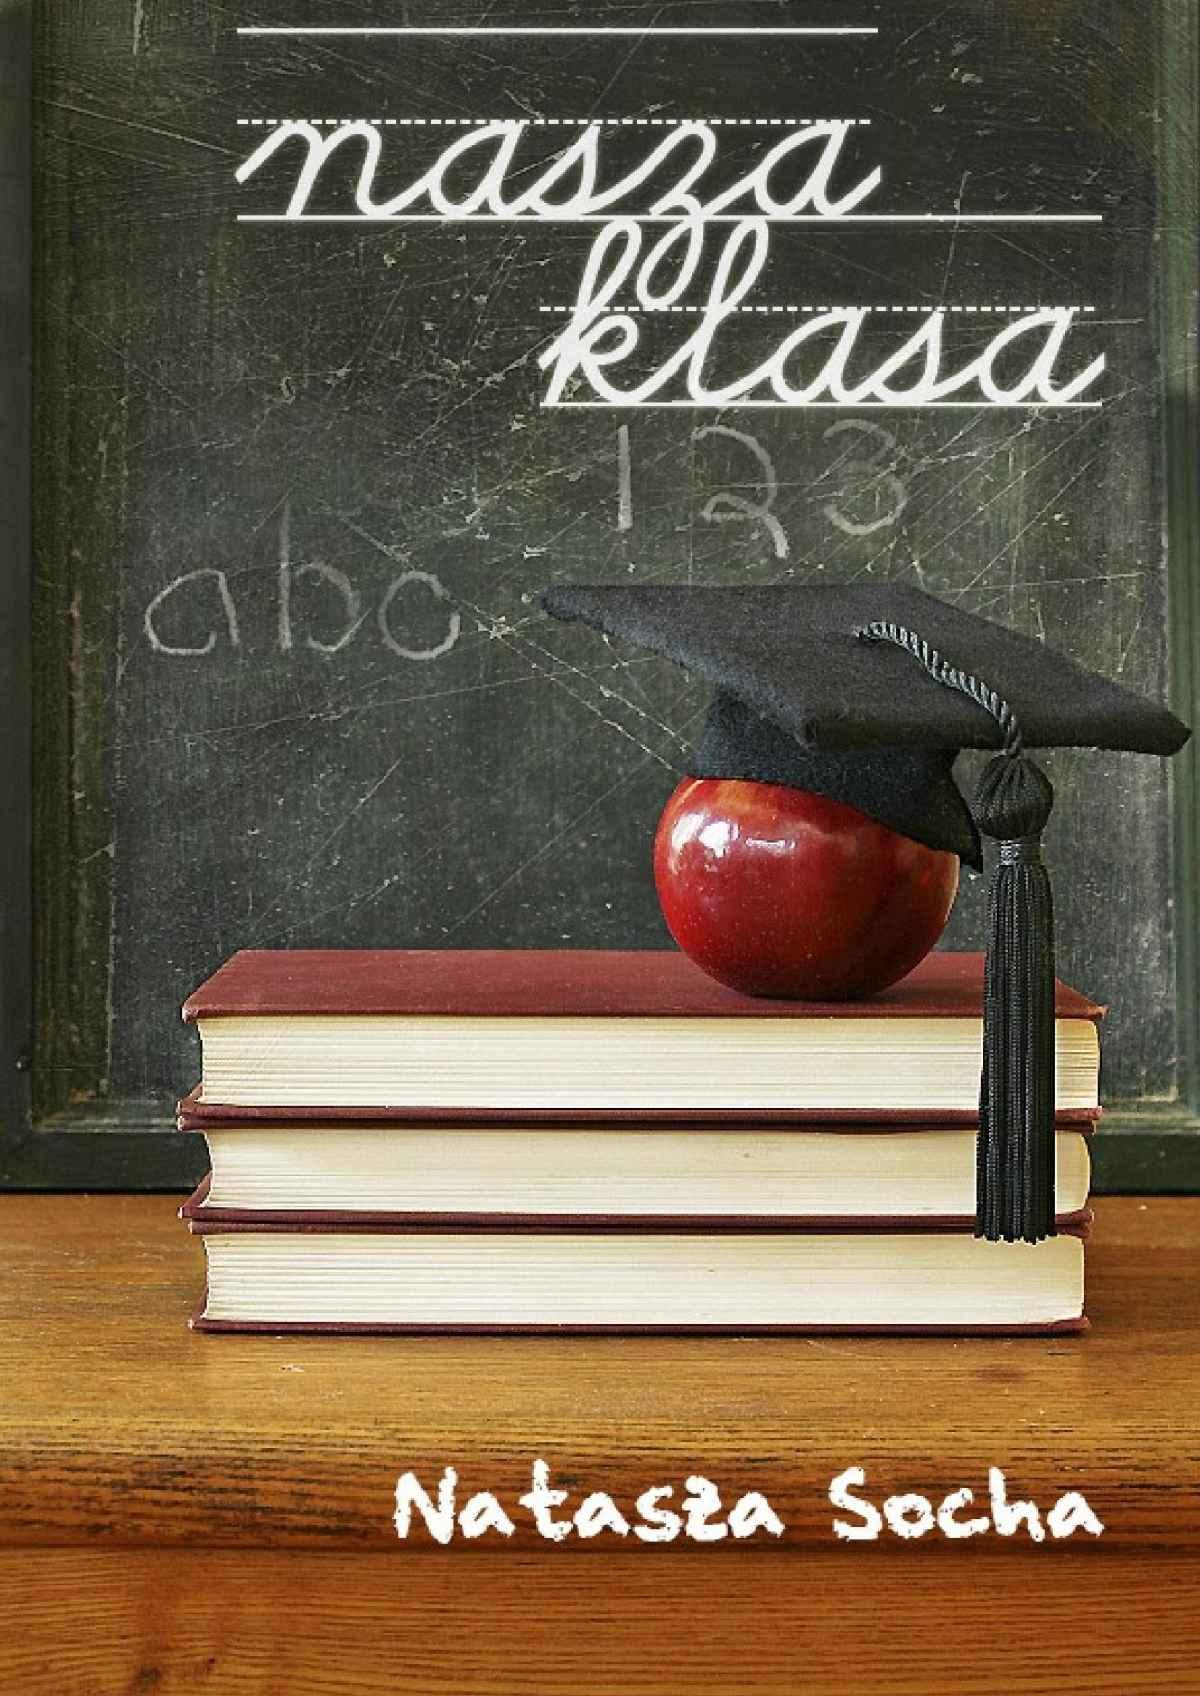 Nasza klasa - Ebook (Książka na Kindle) do pobrania w formacie MOBI